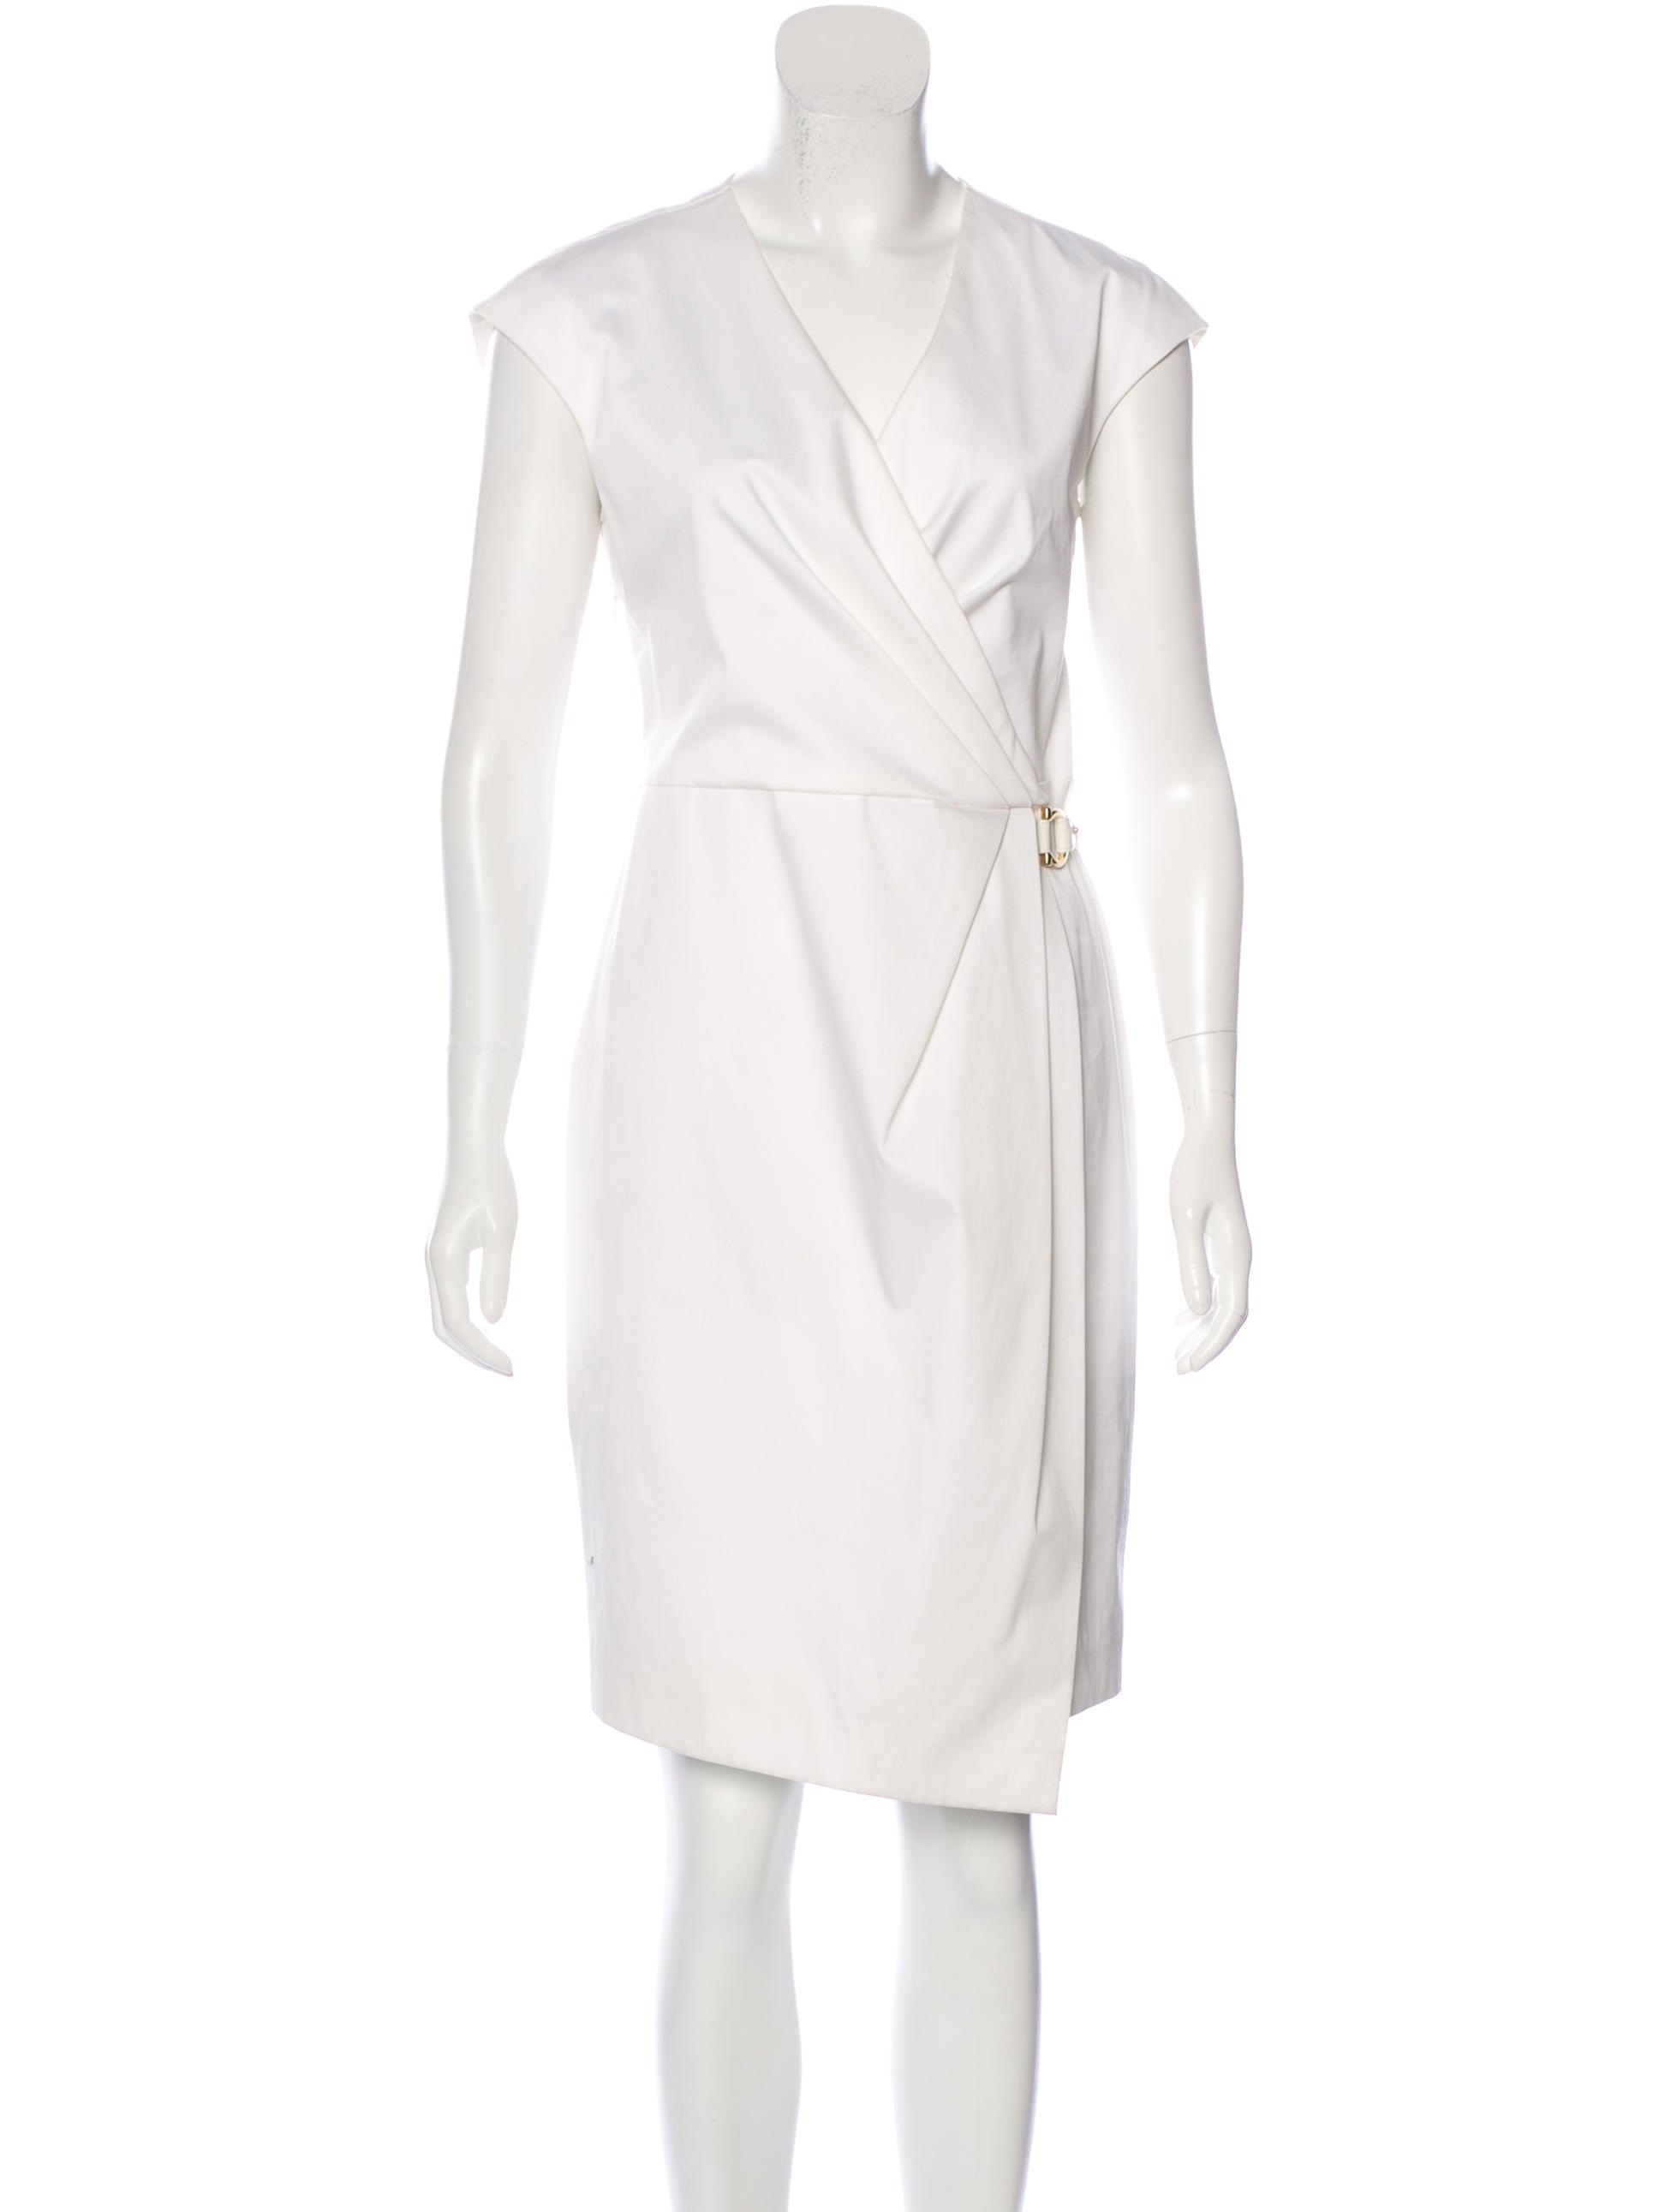 Salvatore Ferragamo Sleeveless Pleat-Accented Dress ...